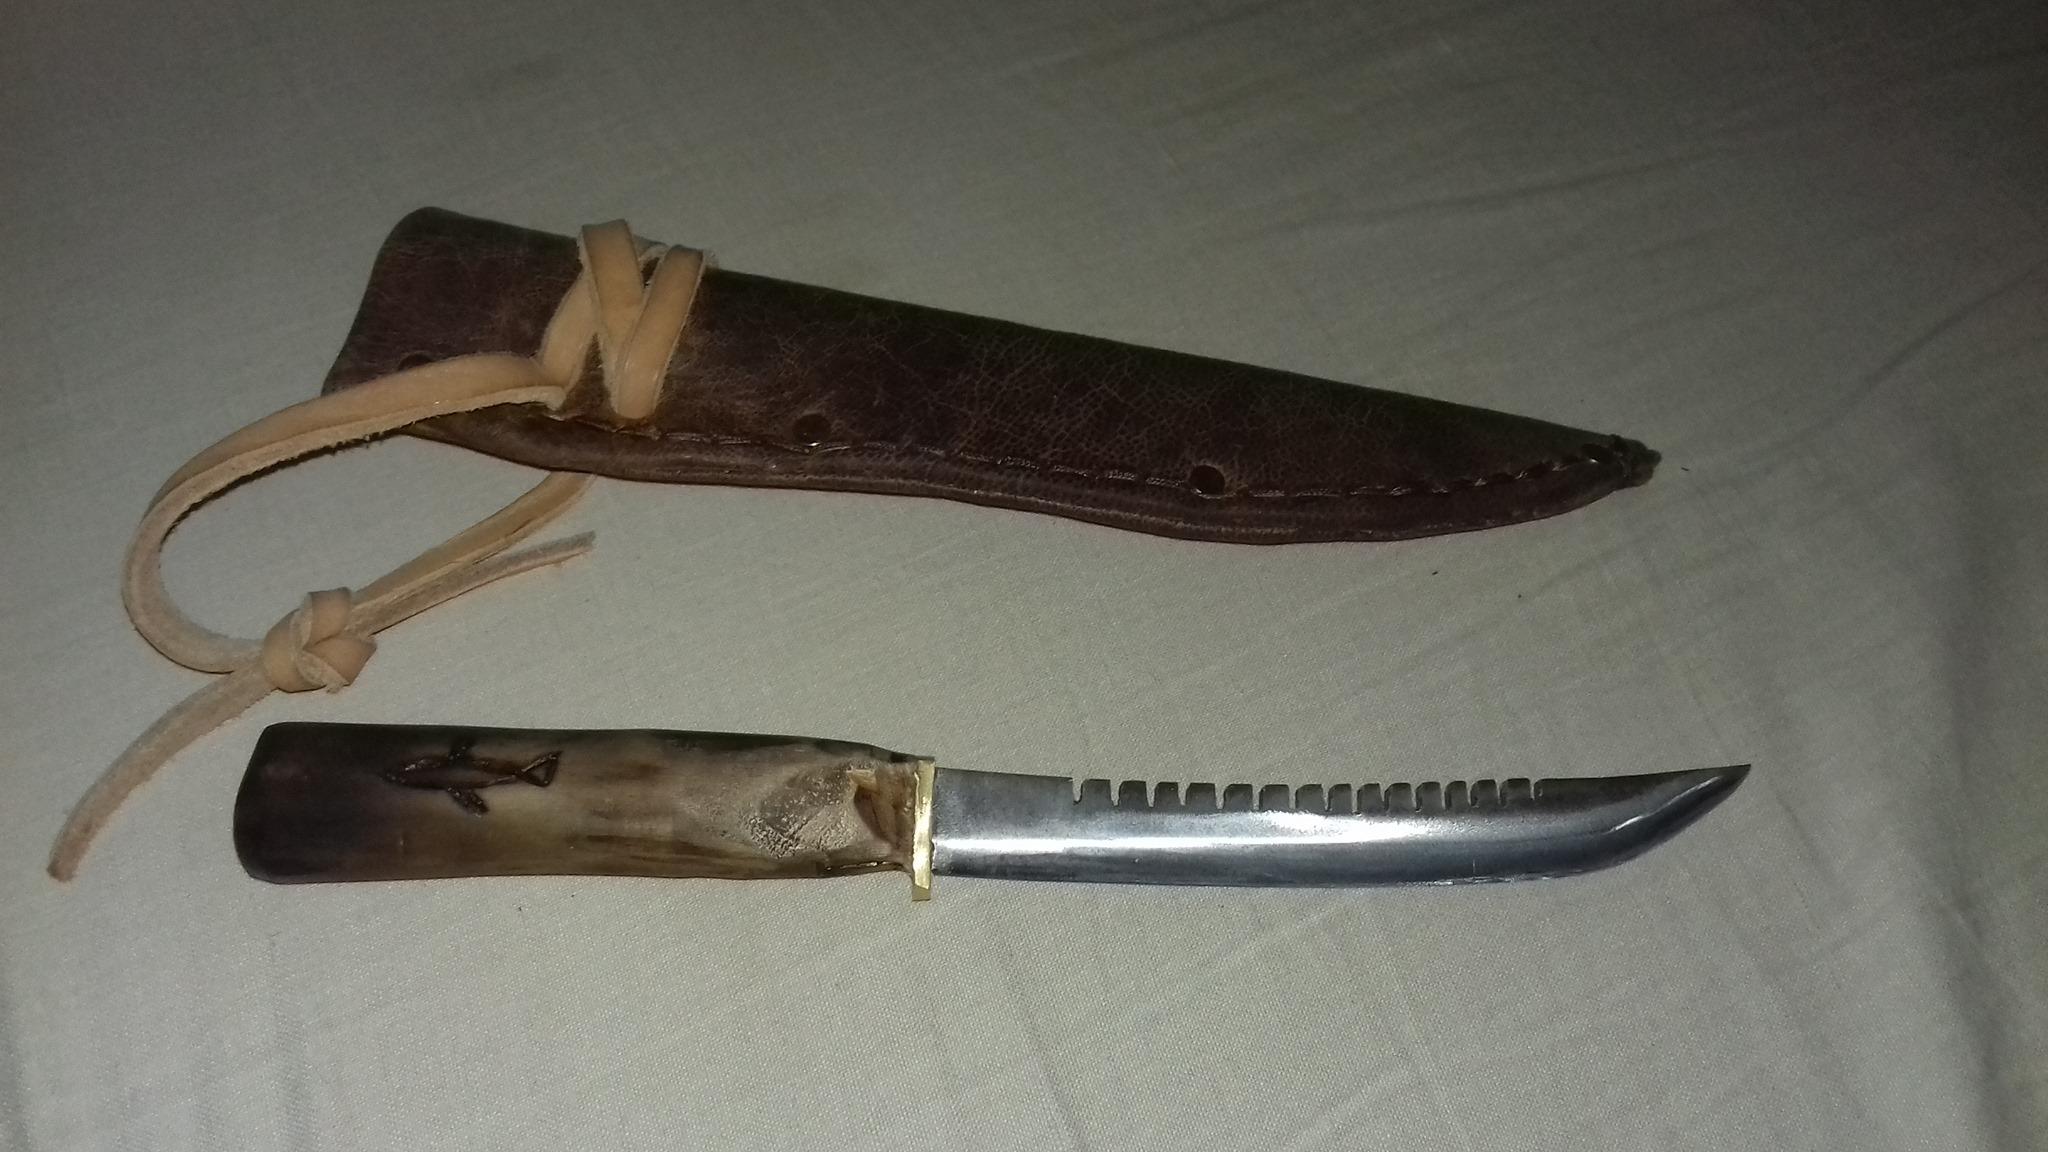 Kalamehe nuga 40 eur